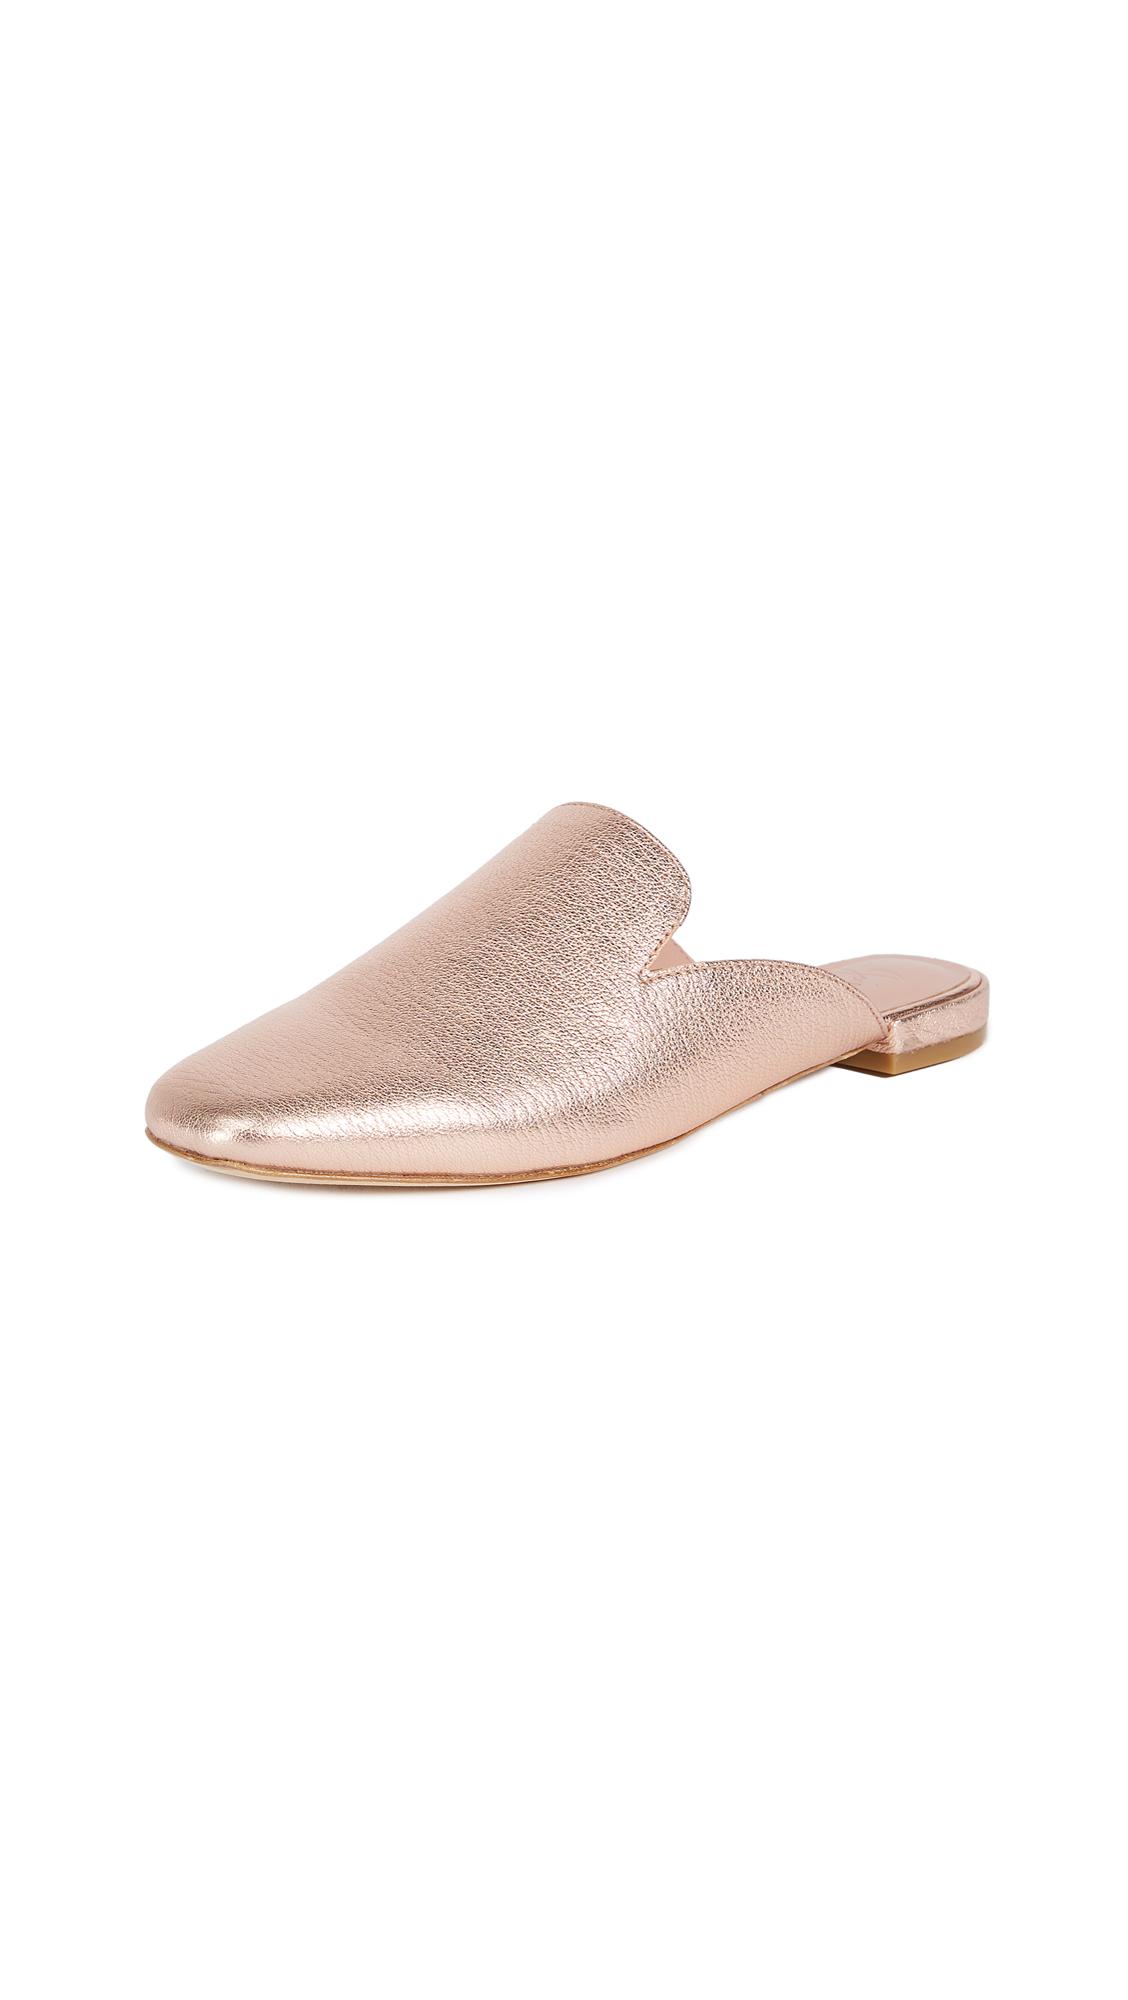 Joie Jadzia Mules - Ballet